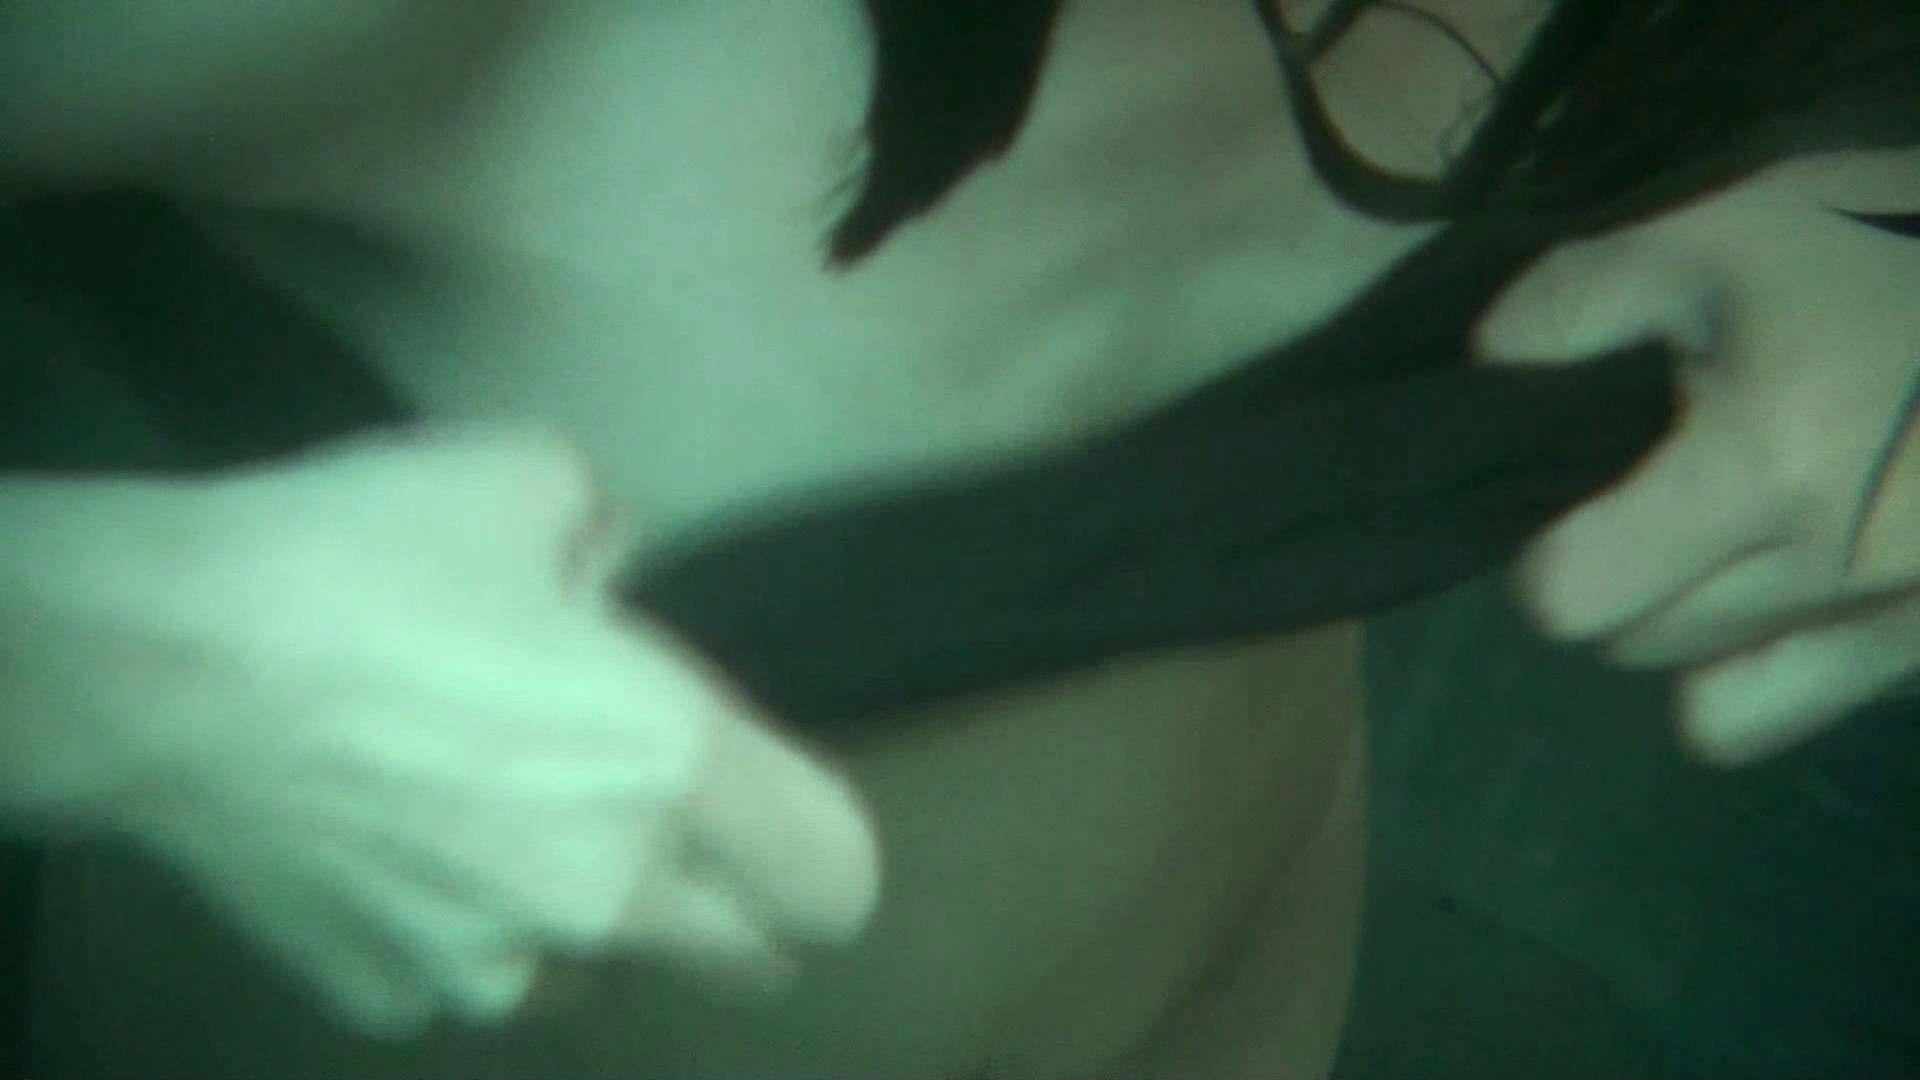 Vol.12 女性の性器には予想外の砂が混入しているようです。 美肌 ワレメ動画紹介 111枚 93